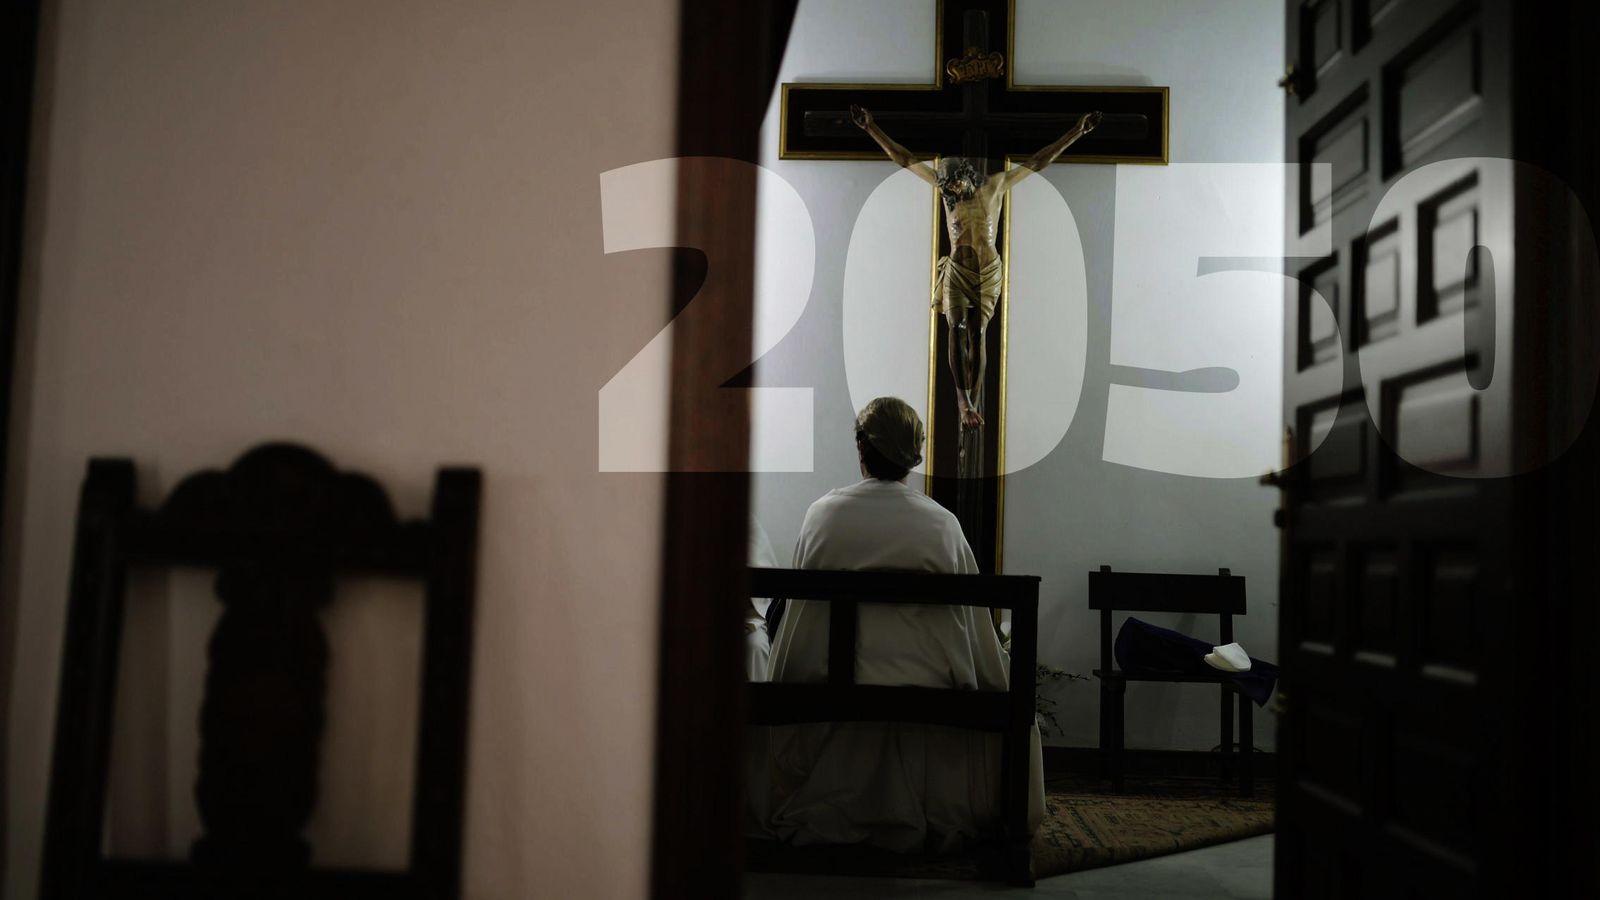 Foto: Un cofrade de la Hermandad de la Sangre reza en la Iglesia de los Capuchinos de Córdoba. (EFE/Rafa Alcaide)